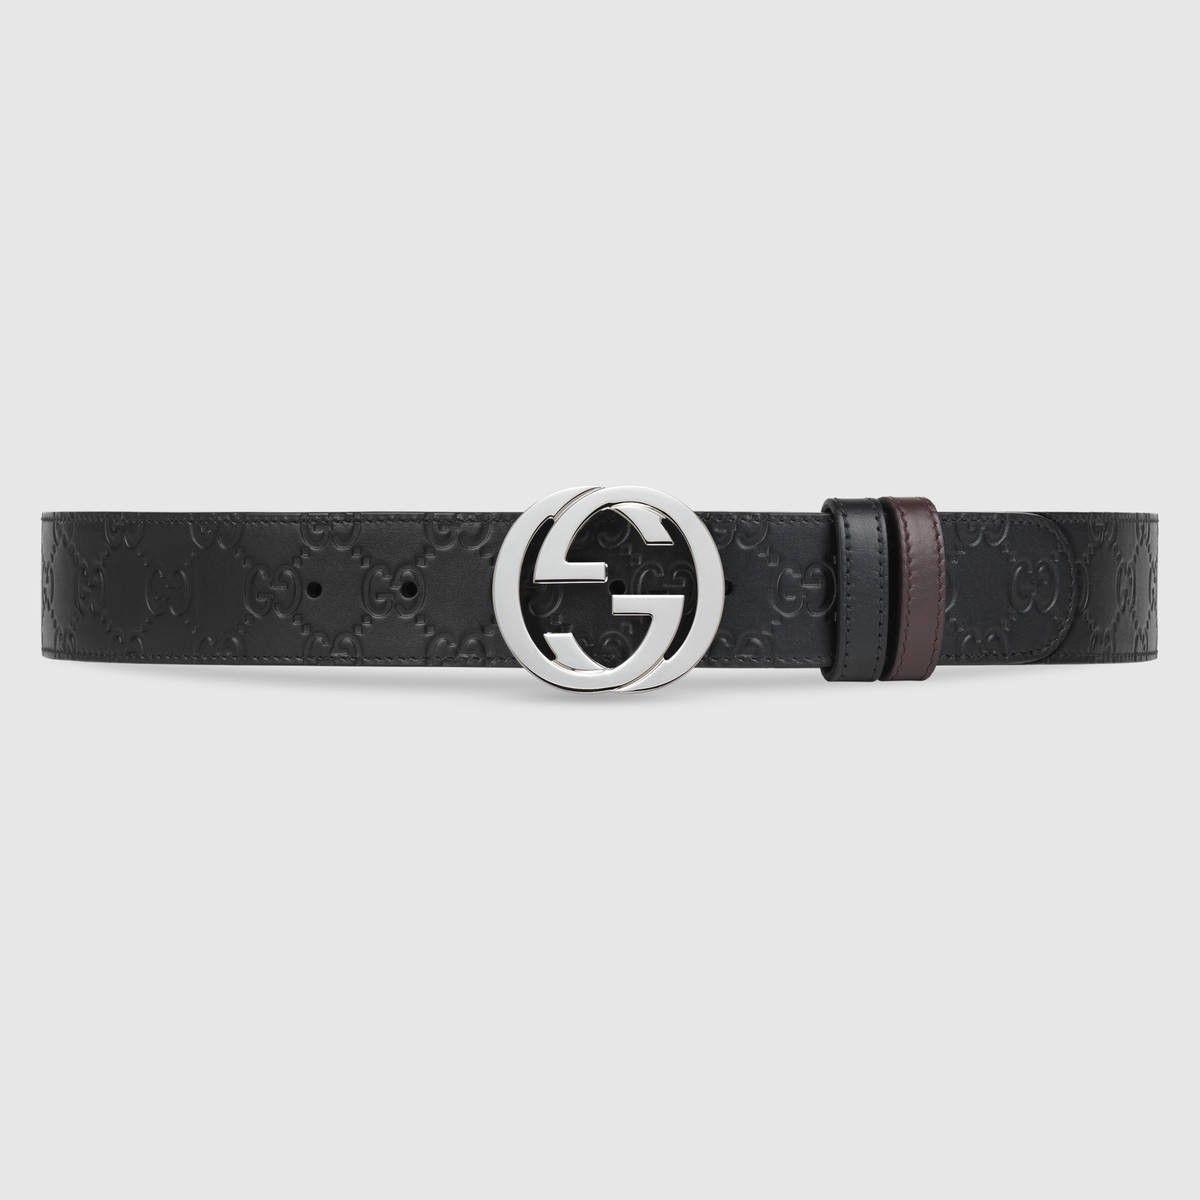 052b9b02617 GUCCI Reversible Gucci Signature belt - black Gucci Signature brown leather.   gucci